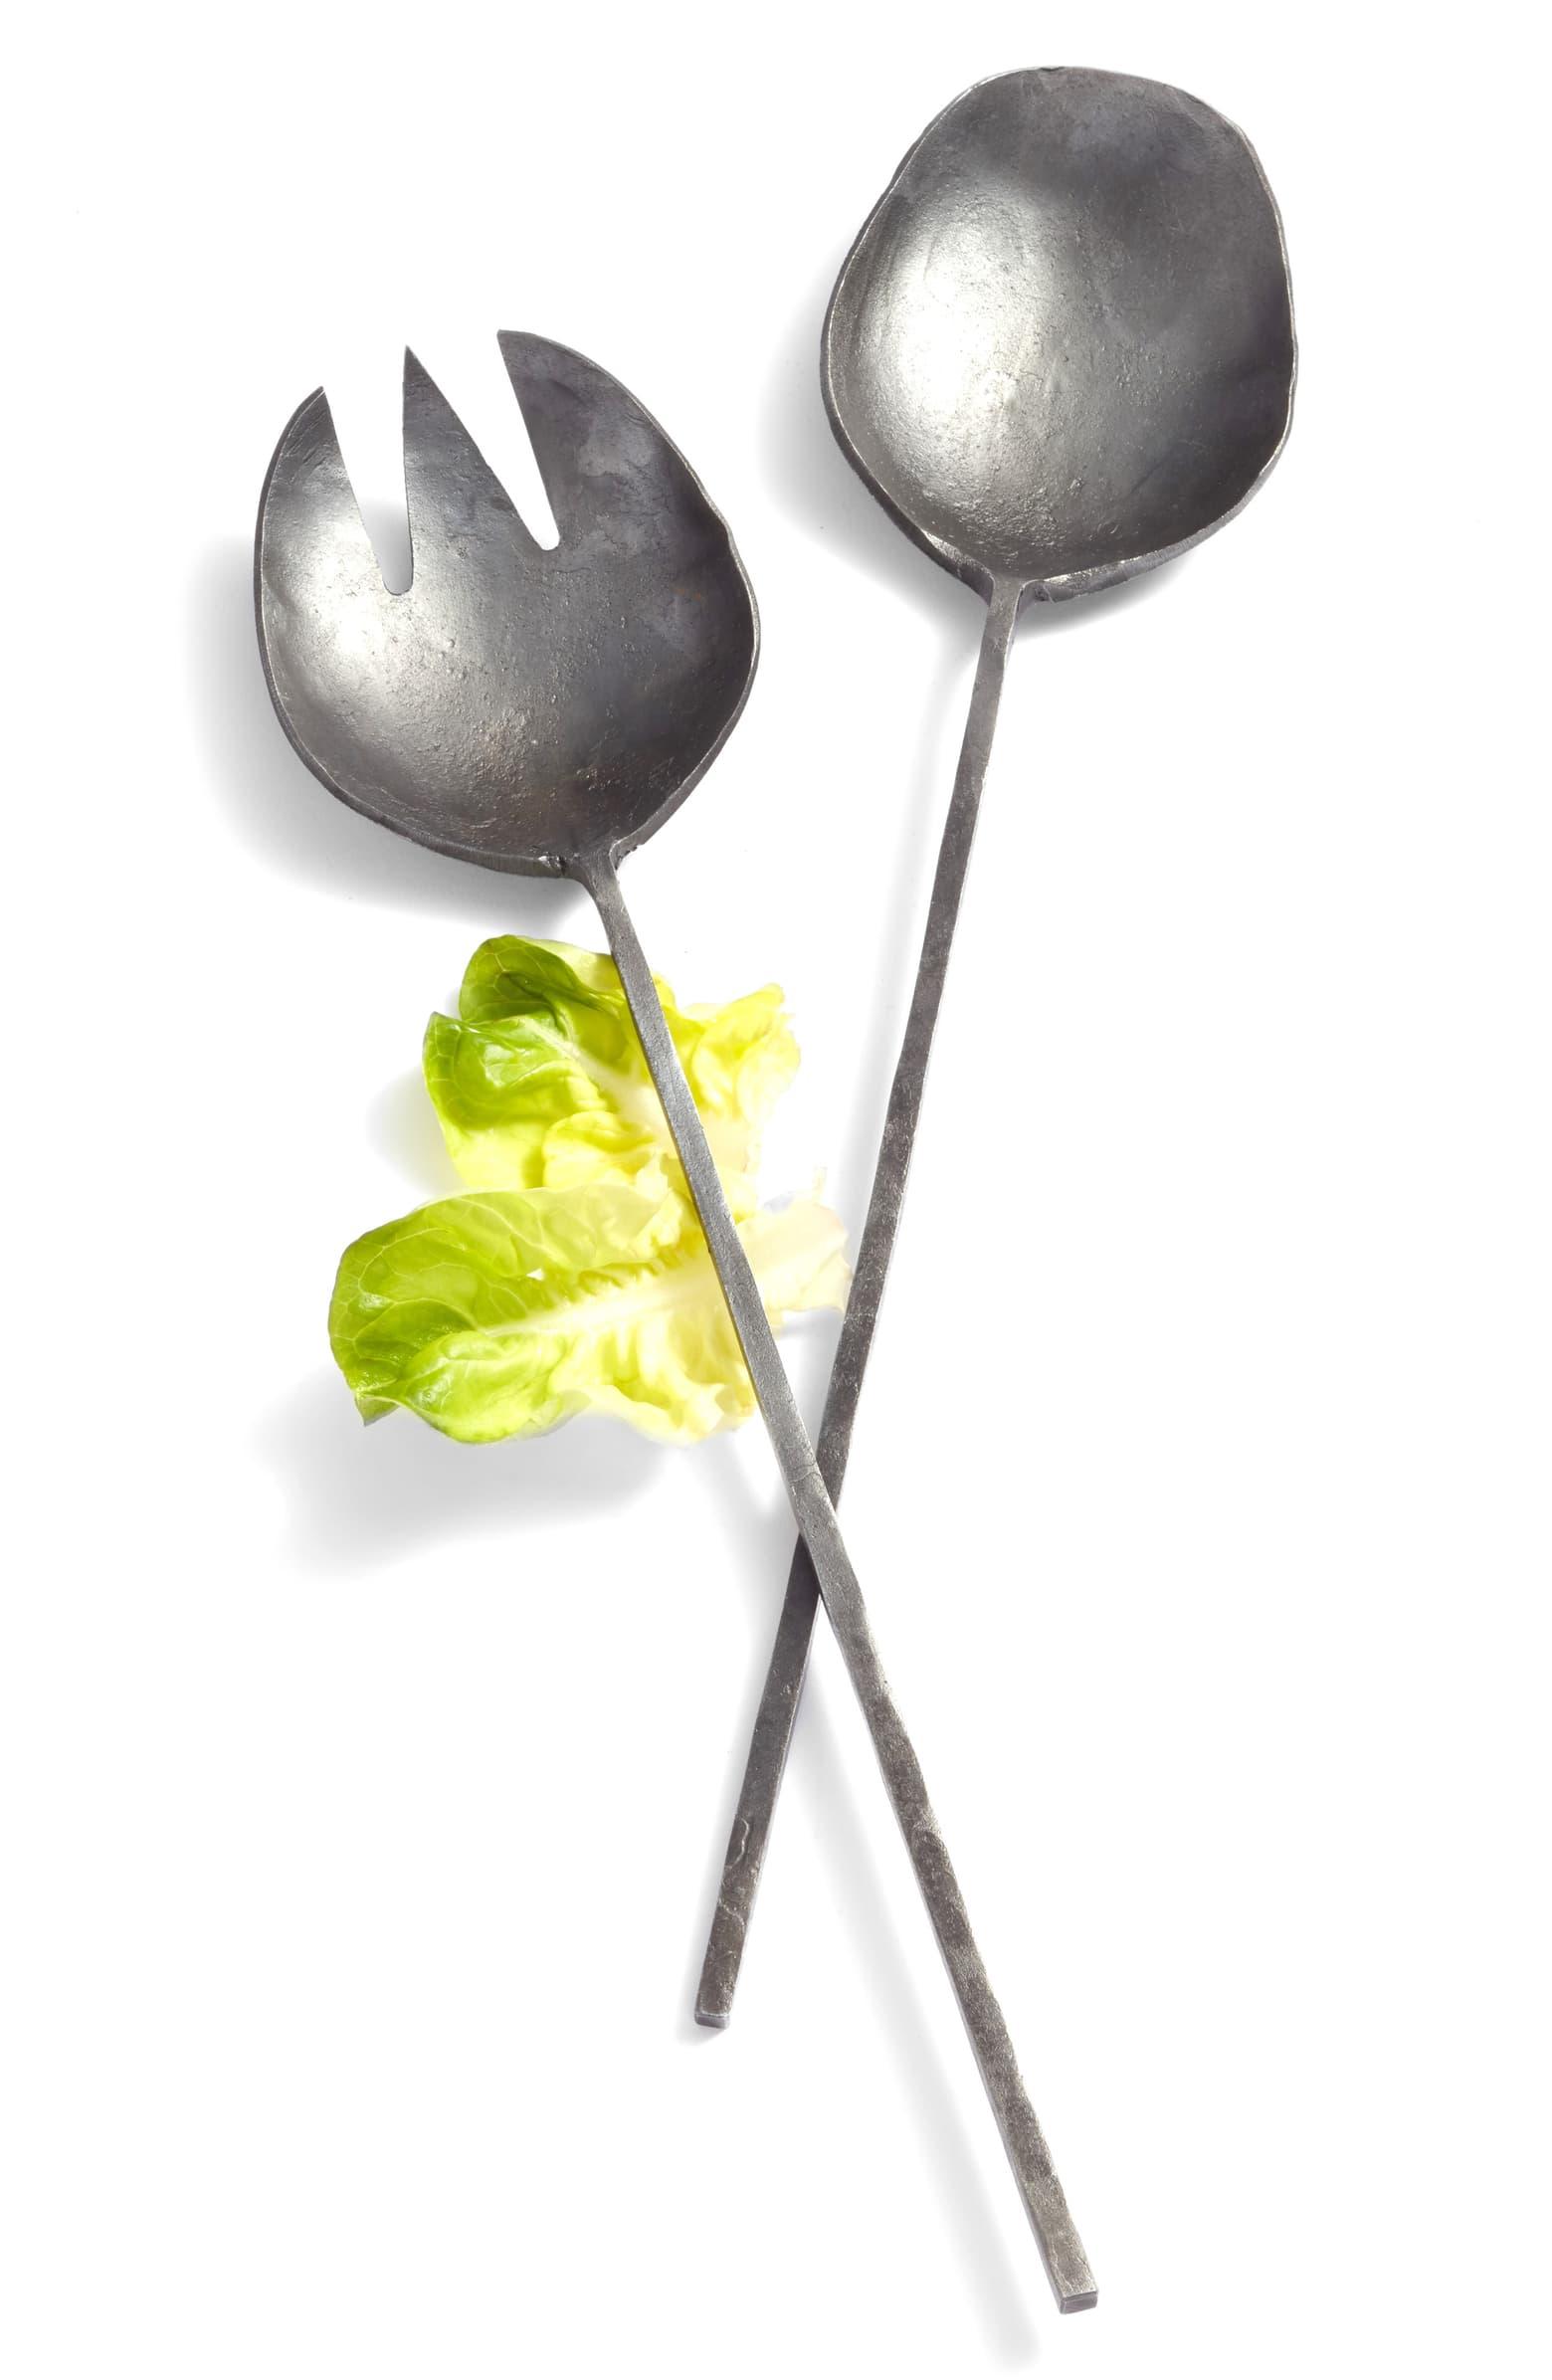 Forged Iron Salad Servers